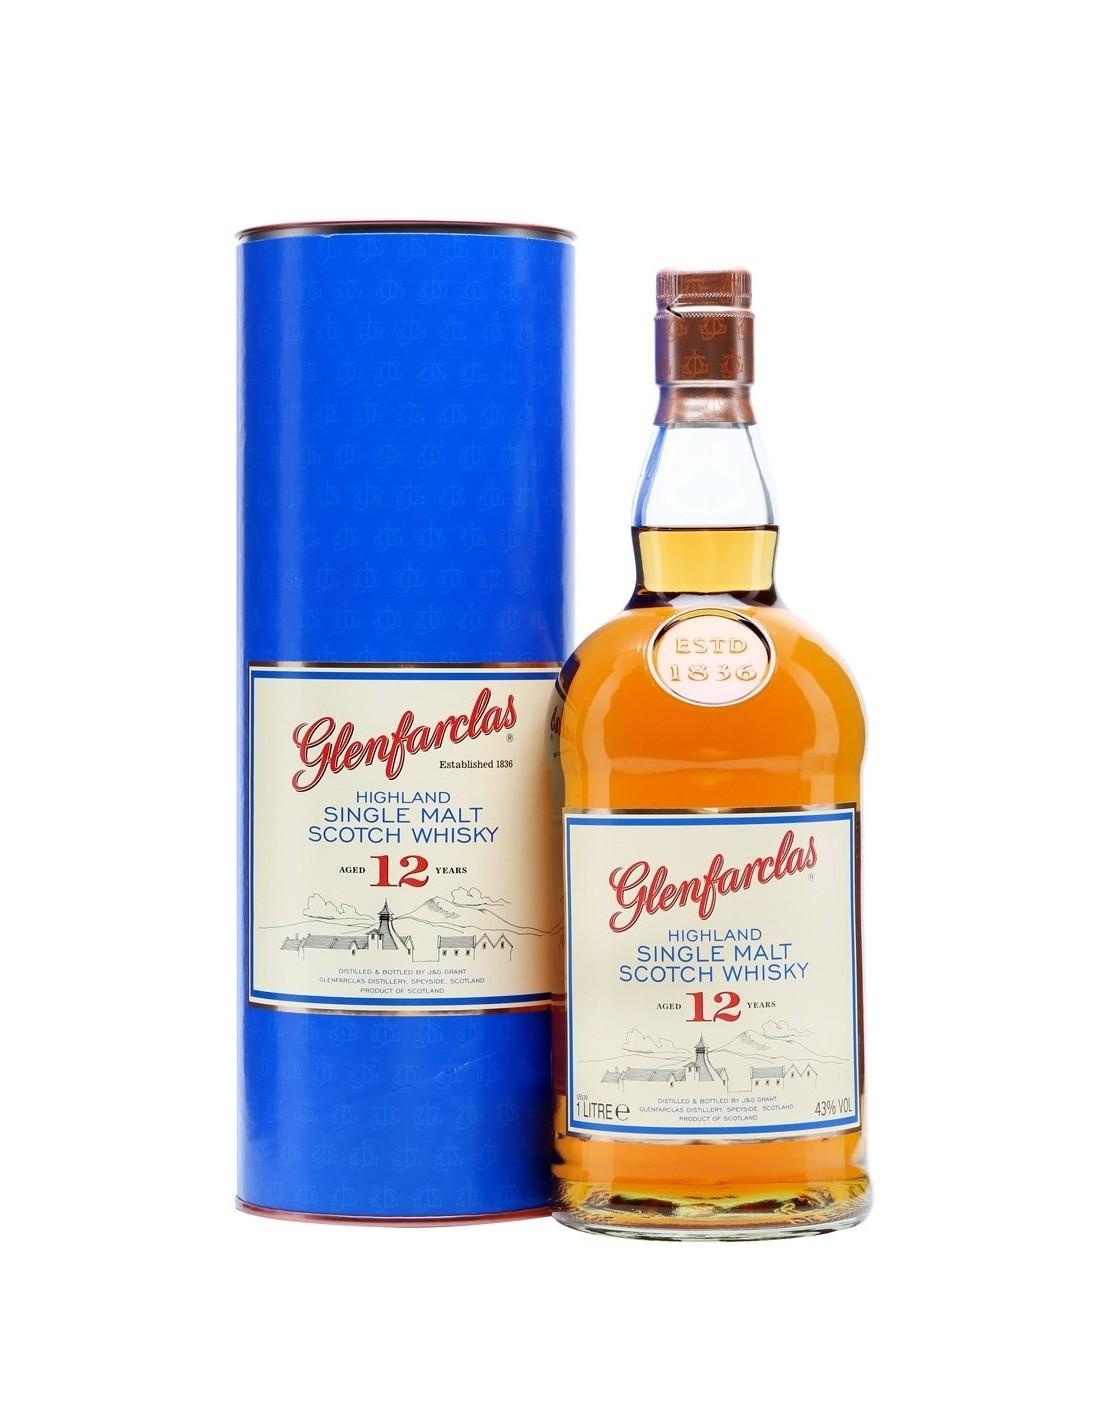 Whisky Glenfarclas, 12 ani, 43% alc., 0.7L, cutie, Scotia